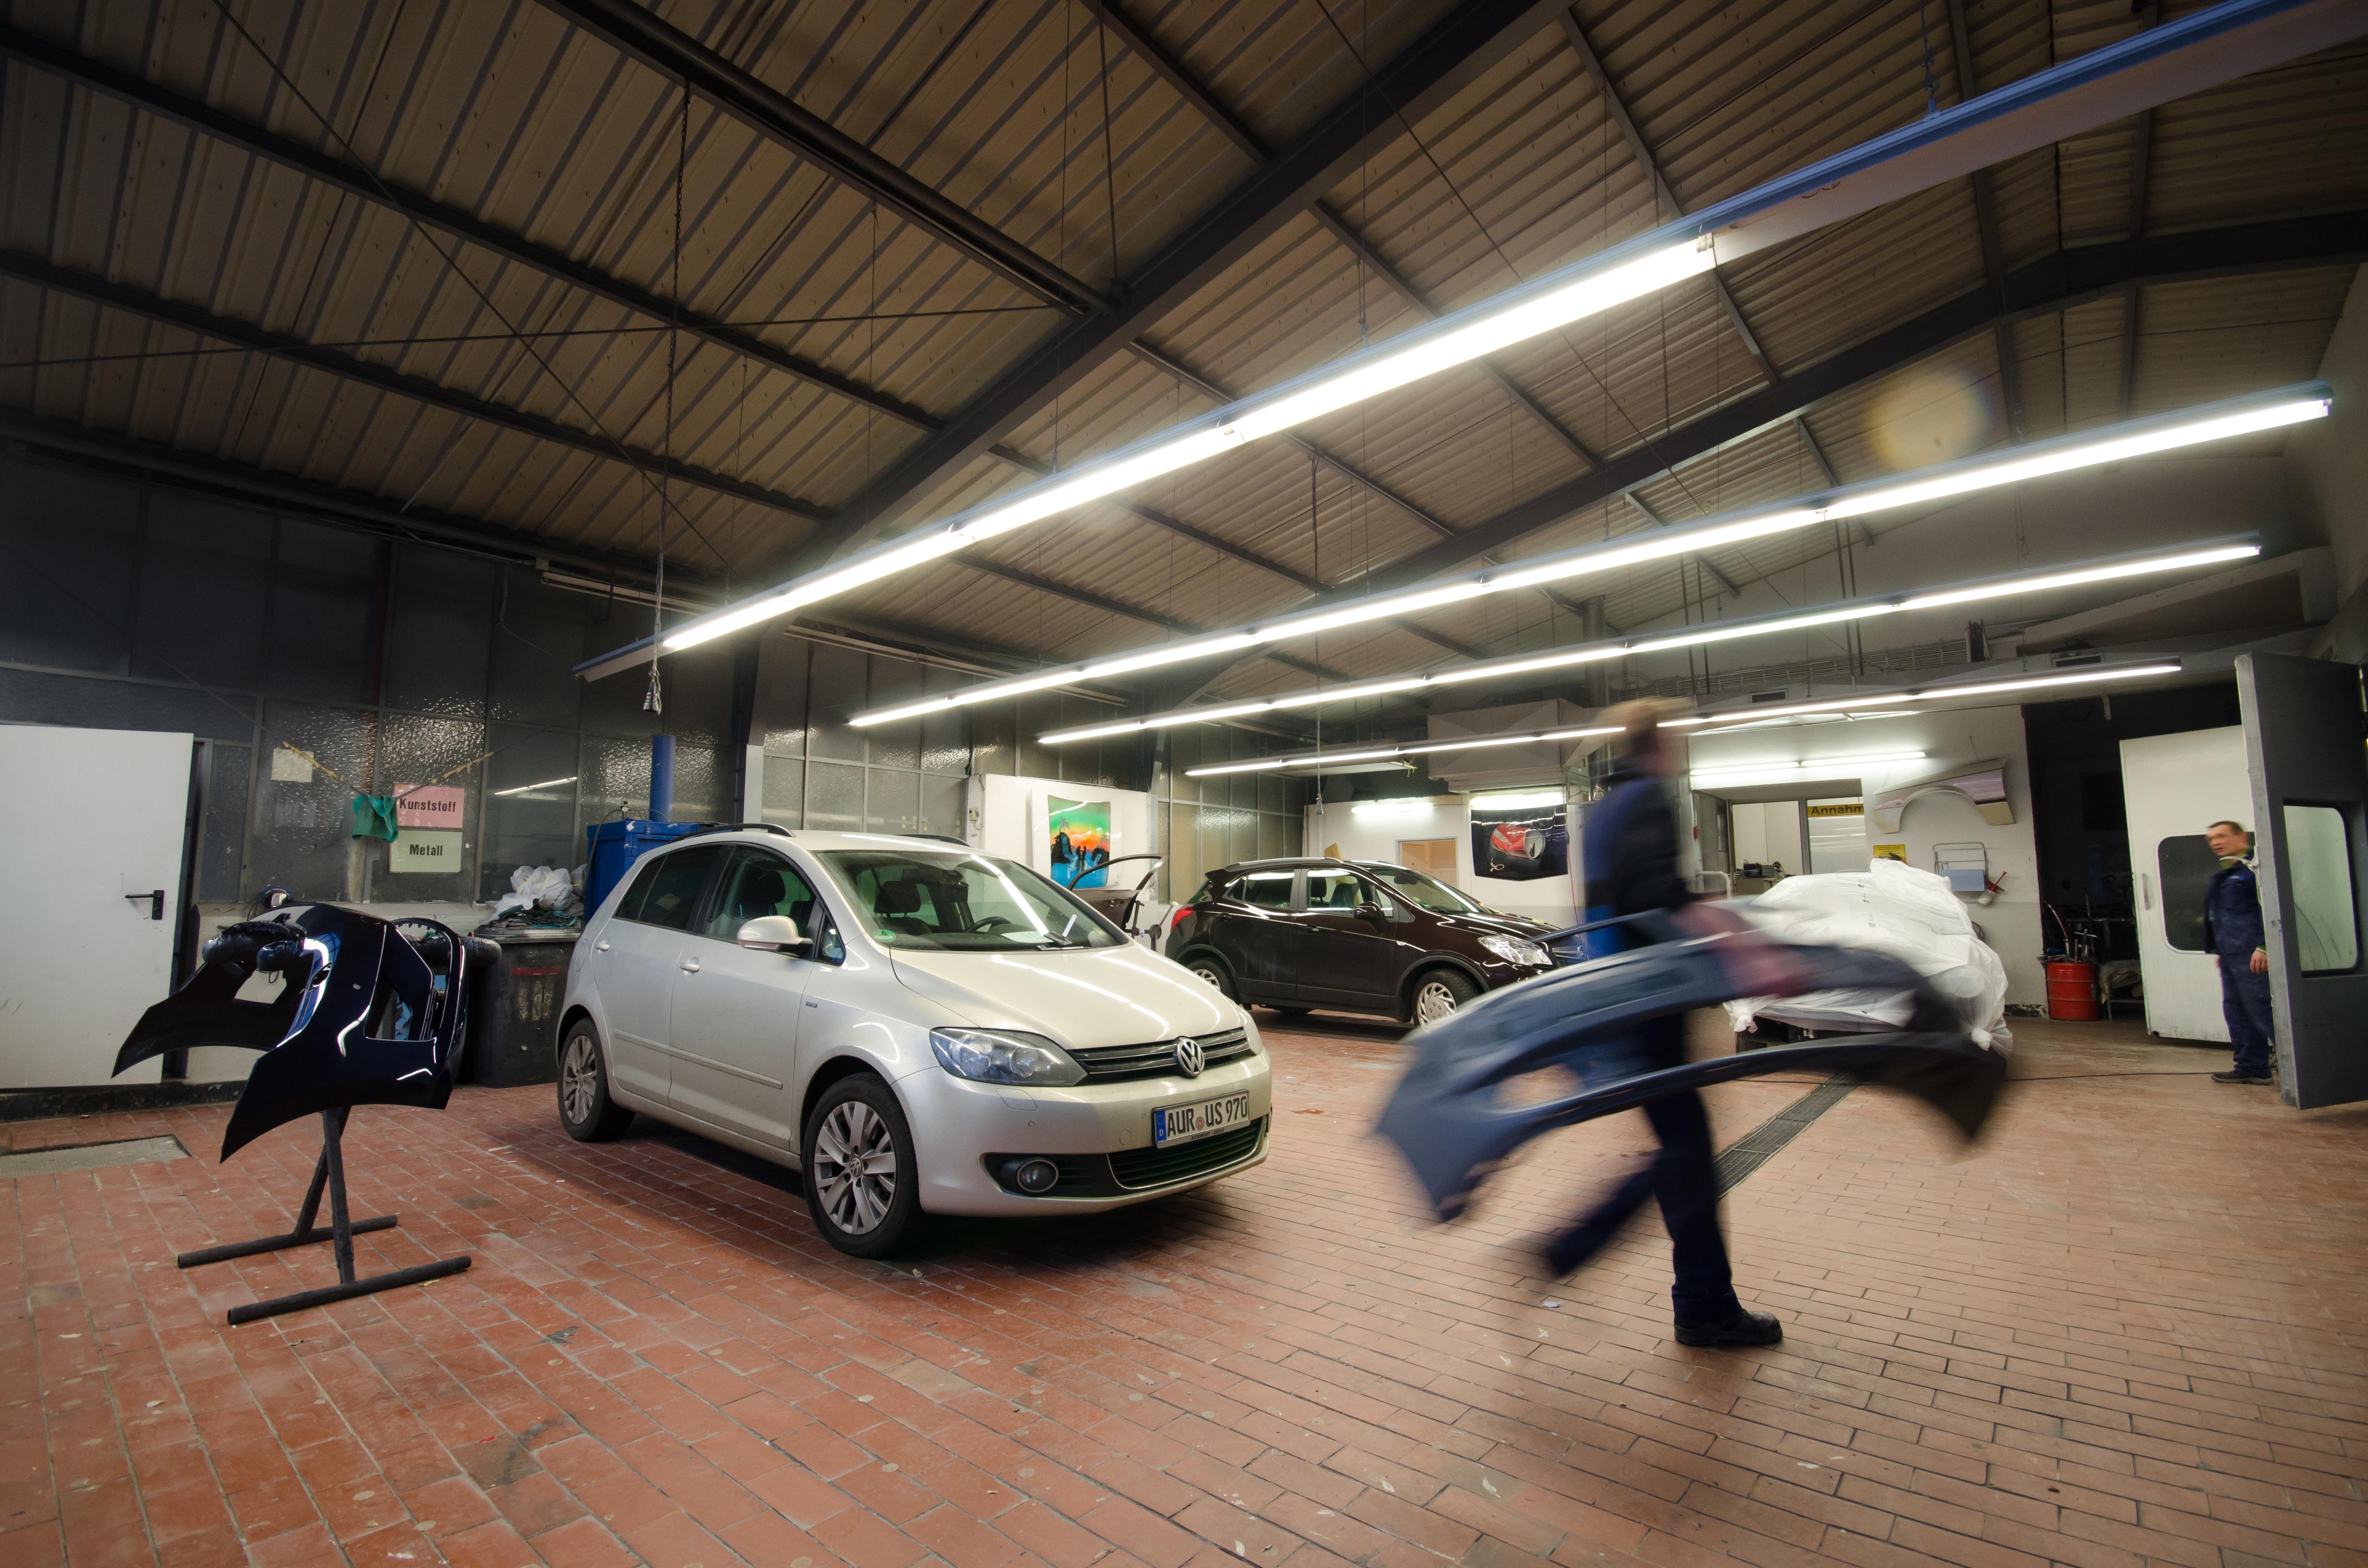 DSC_9032.jpg – HIRO Automarkt GmbH